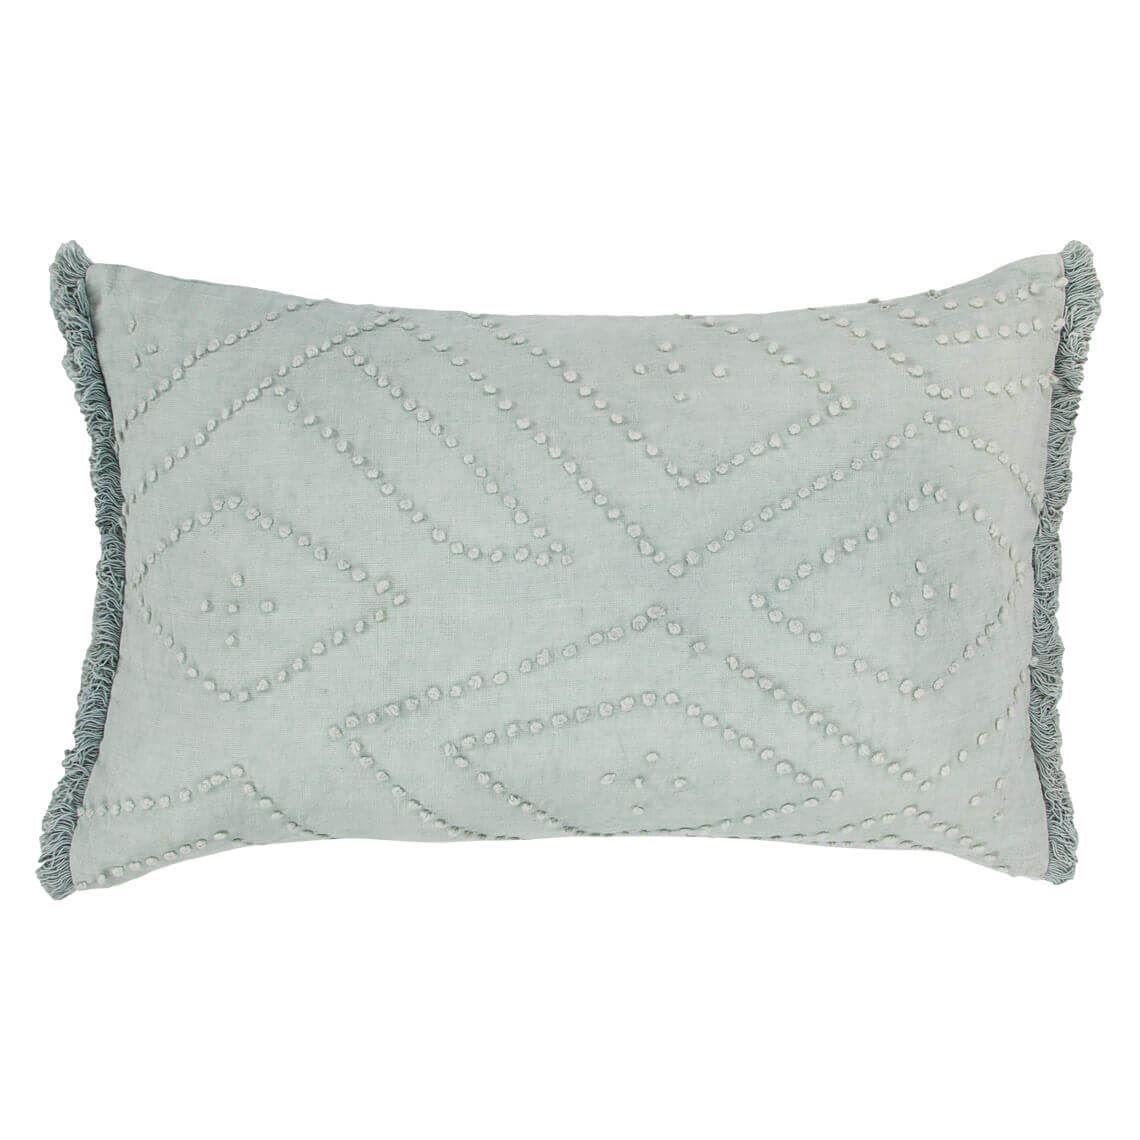 Lenzo Cushion Size W 35cm x D 55cm x H 14cm in Sky 50%cotton/50%linen Freedom